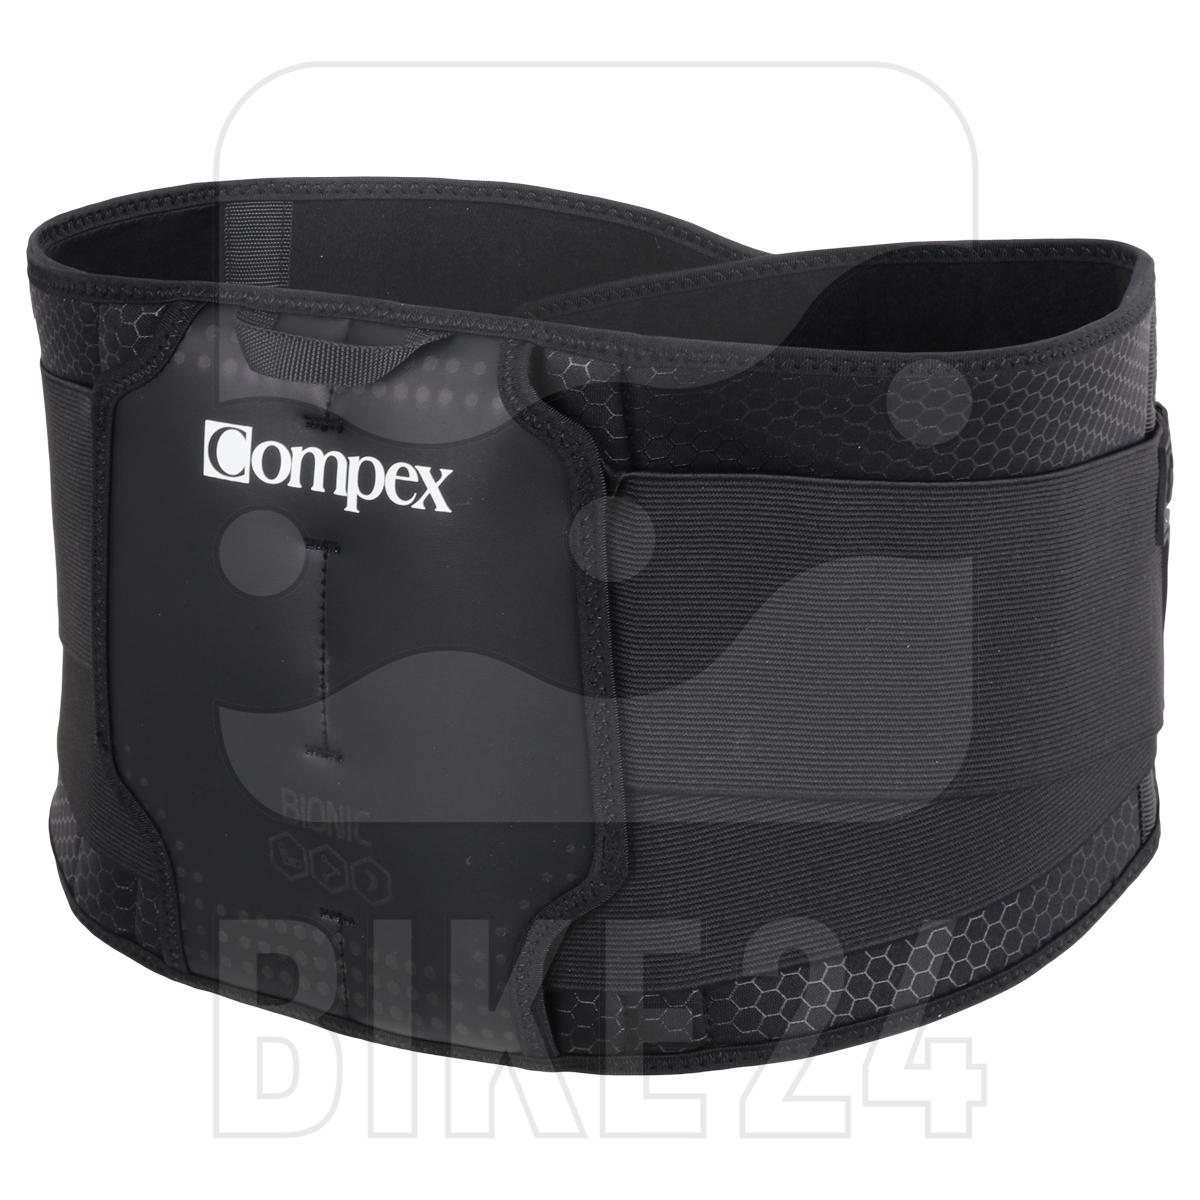 Picture of Compex BIONIC Back Compression Wrap